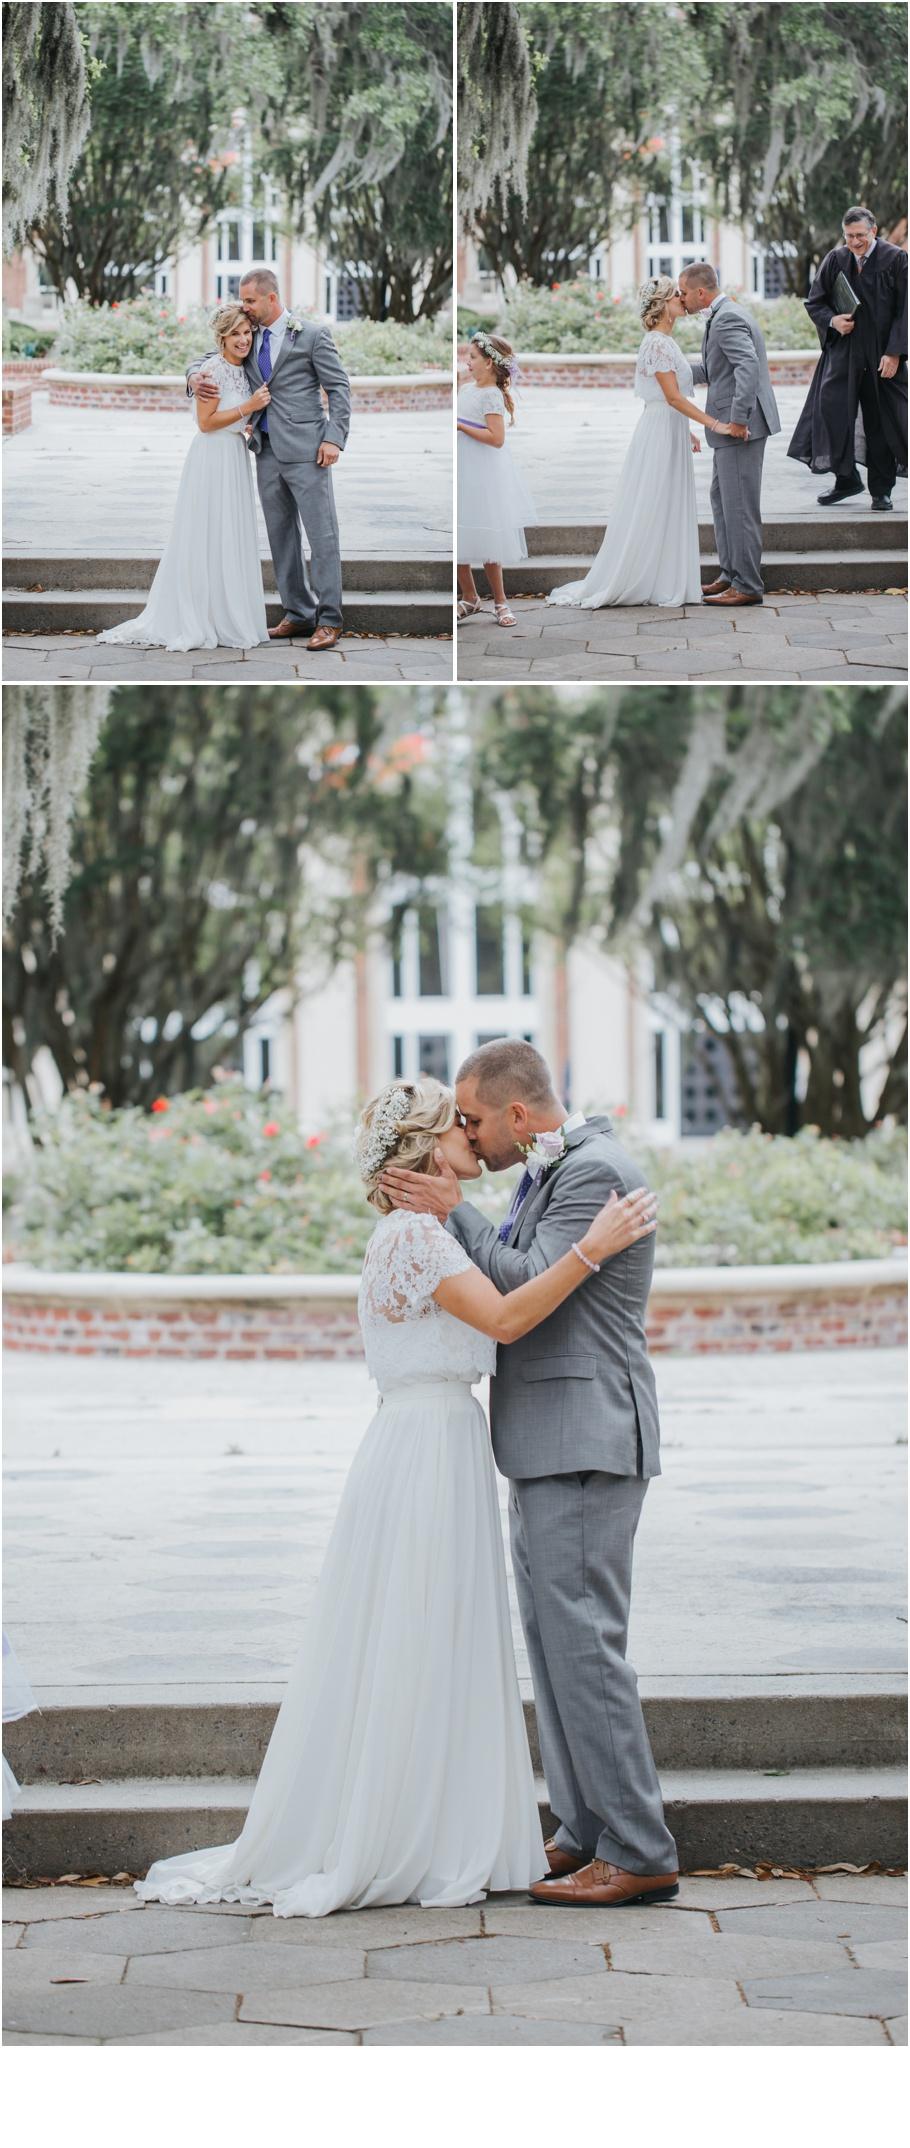 Rainey_Gregg_Photography_St._Simons_Island_Georgia_California_Wedding_Portrait_Photography_1518.jpg